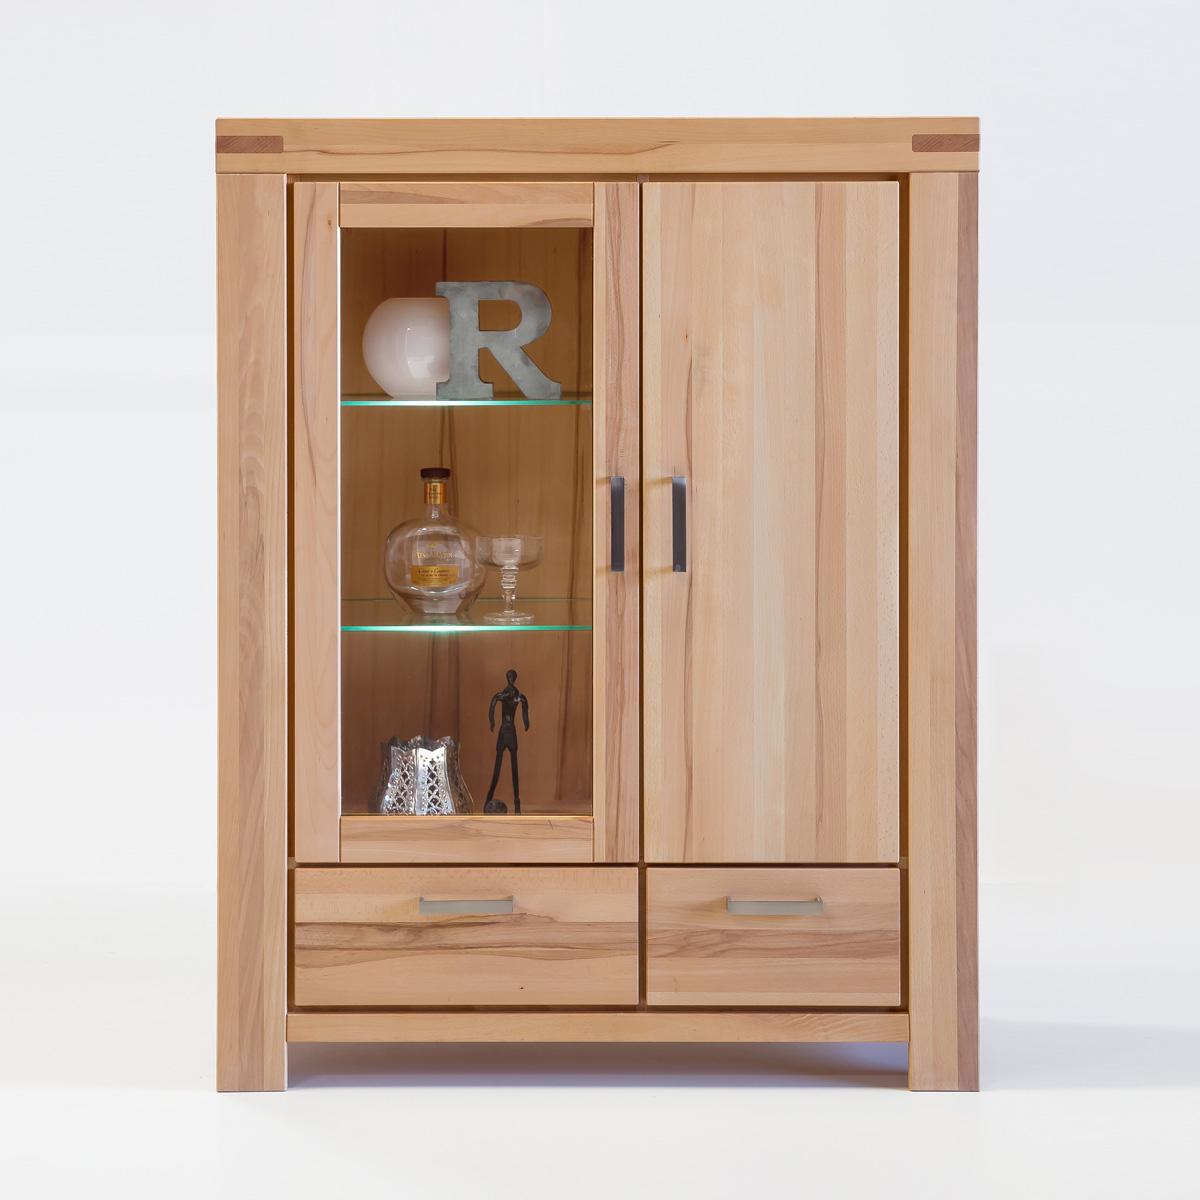 vitrine kira standvitrine buffet auswahl kernbuche wildeiche massiv ge lt bianco. Black Bedroom Furniture Sets. Home Design Ideas